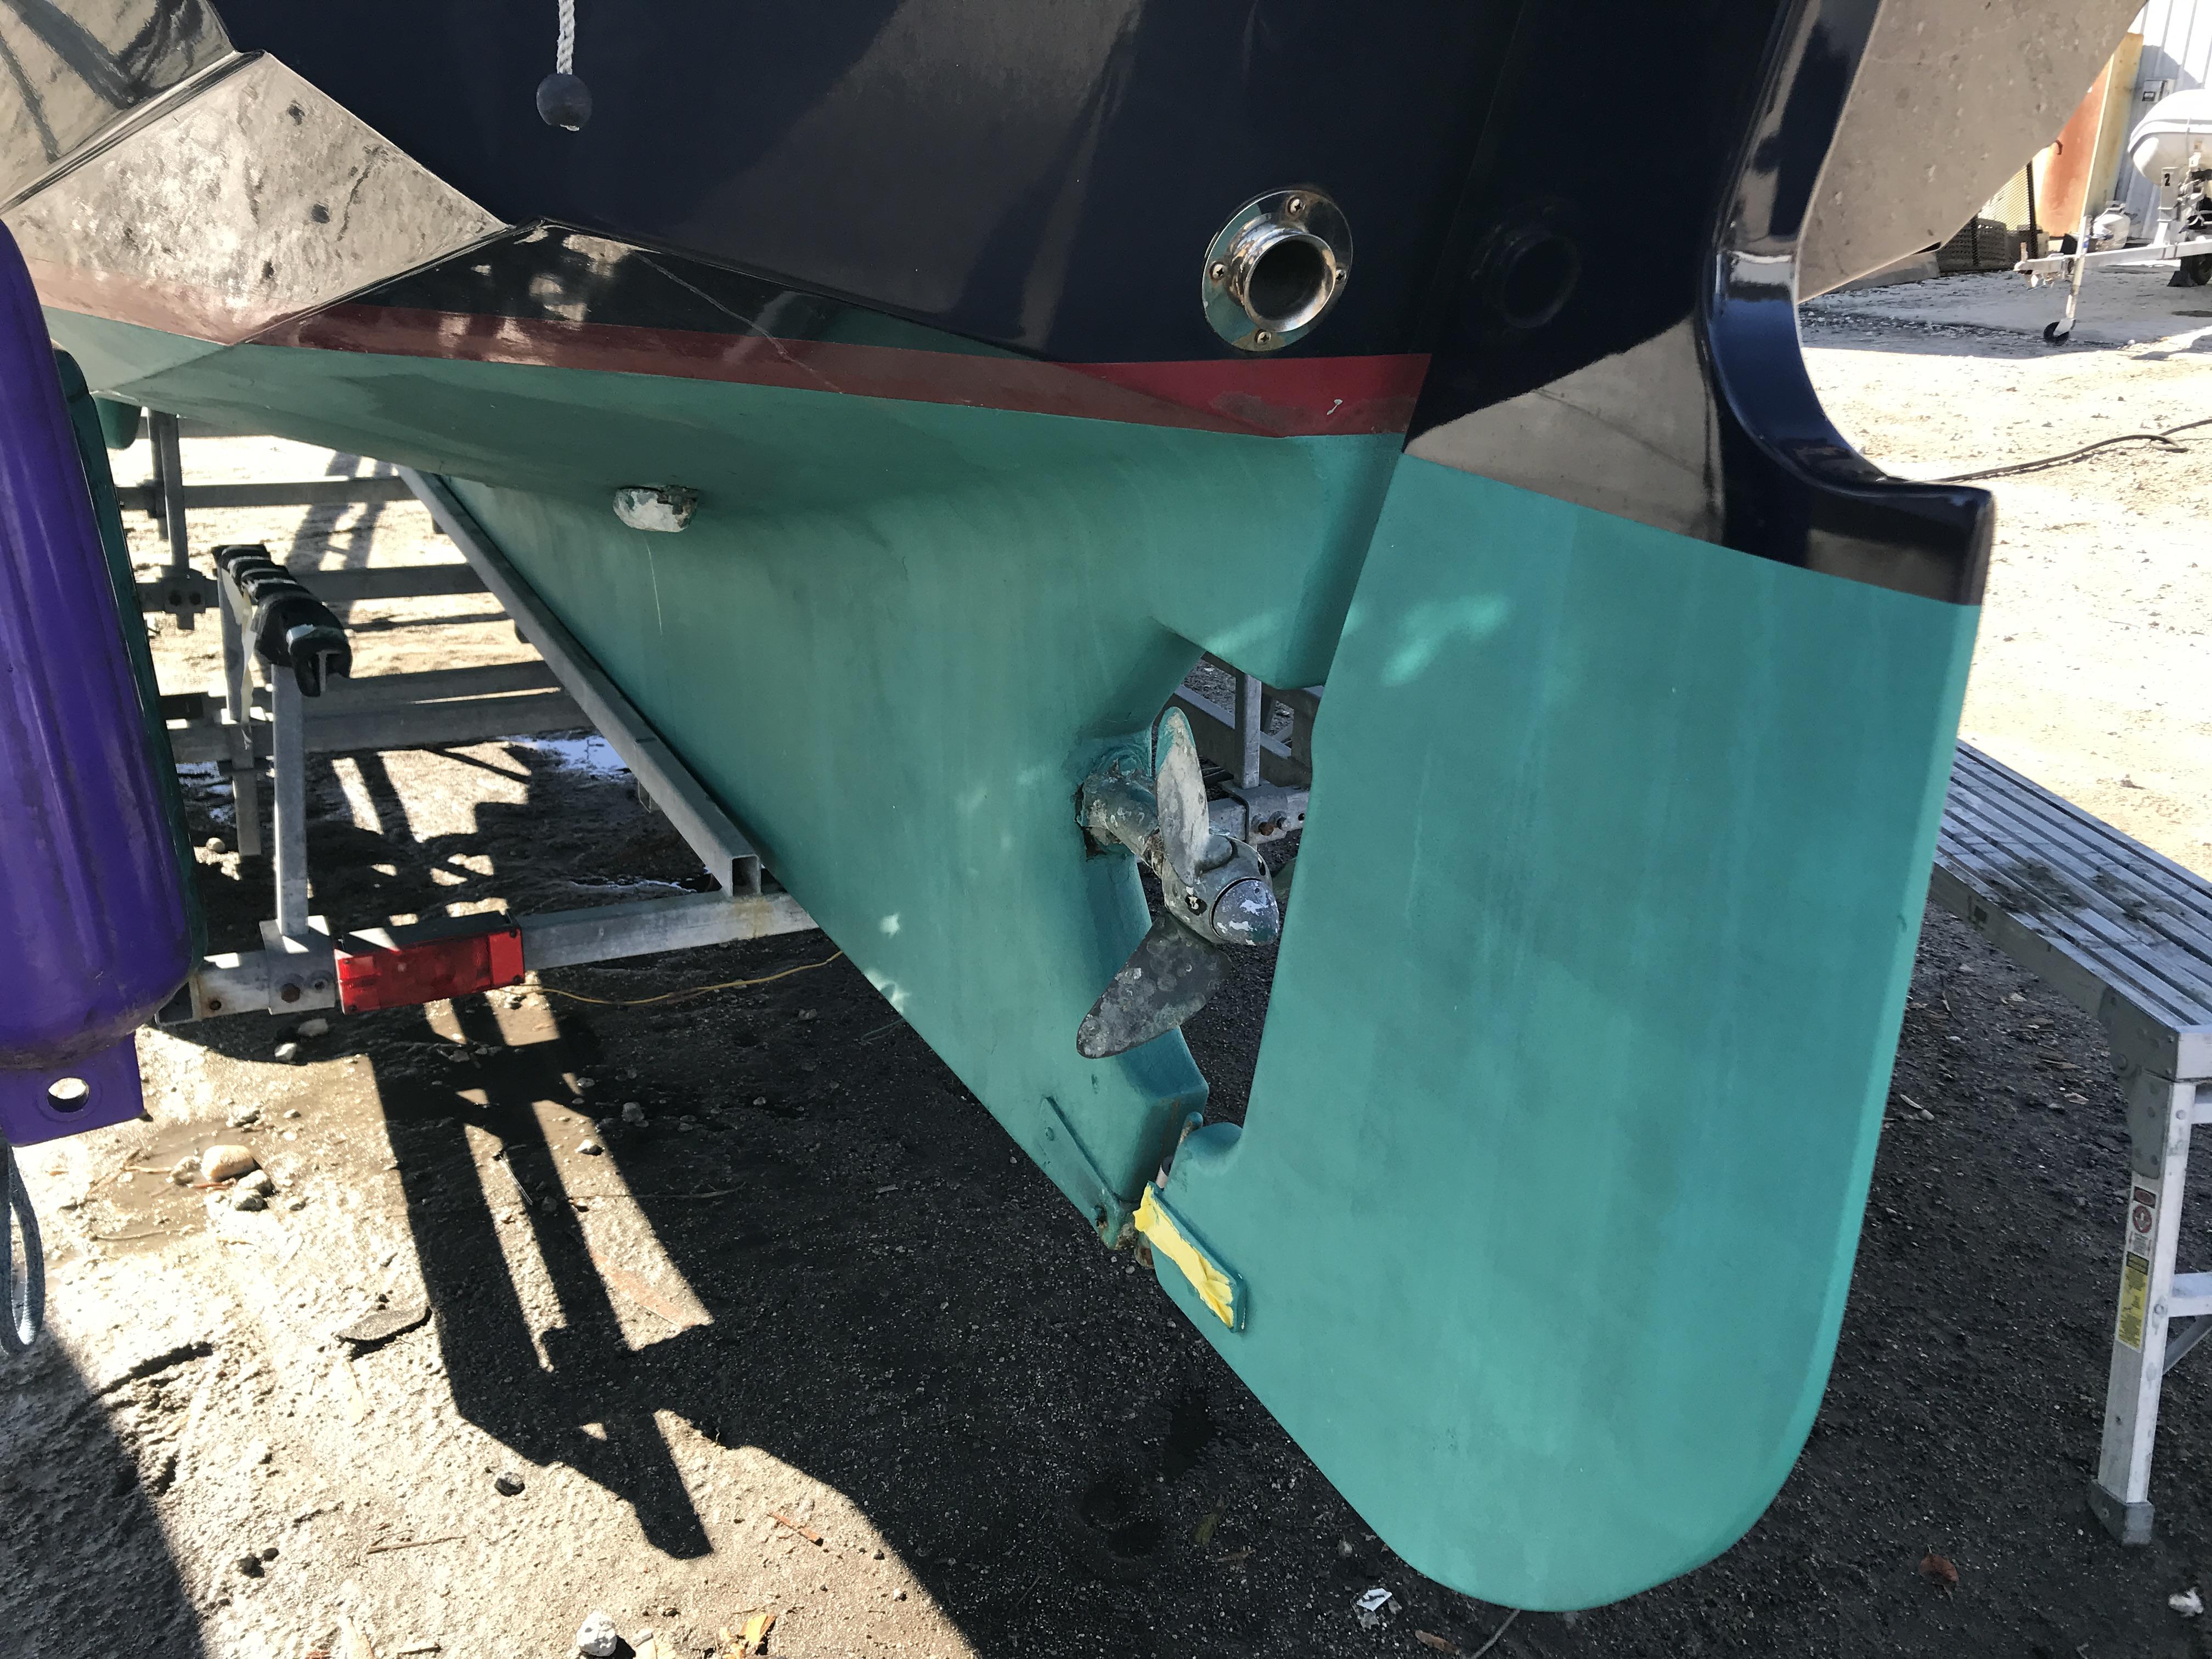 Cornish Crabbers Crabber 22 - new bottom paint keel and tiller